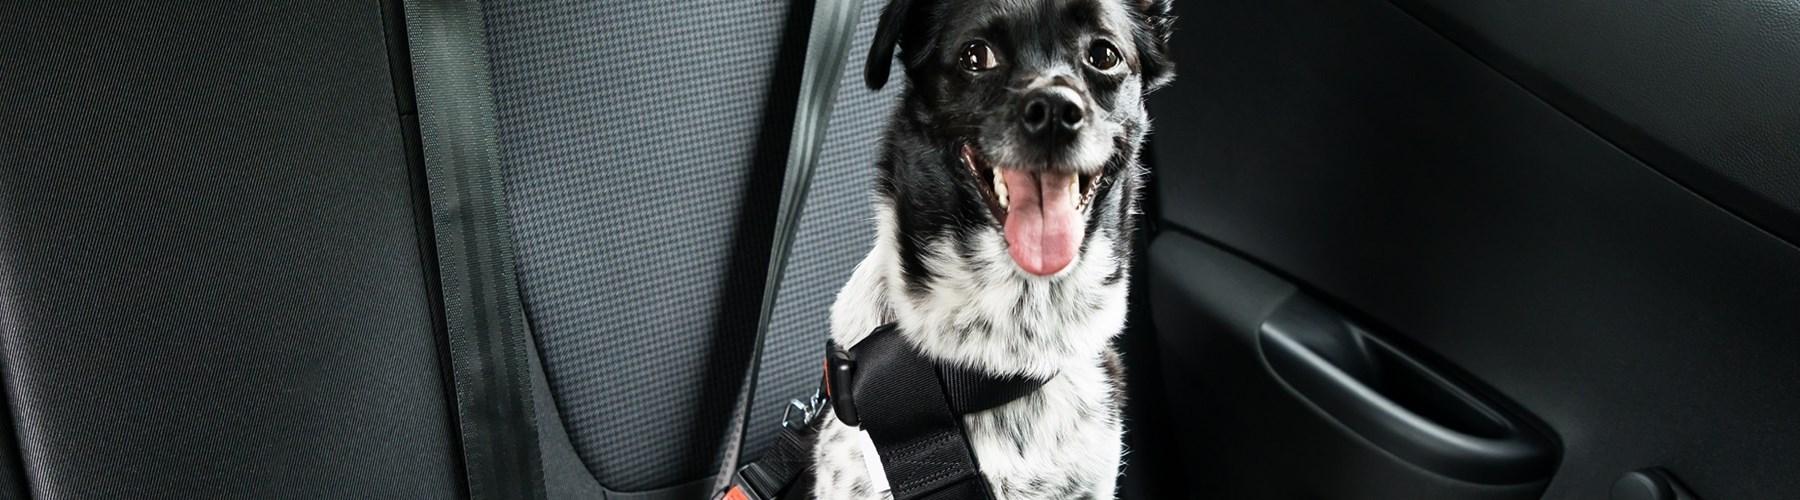 Dog wearing a seat belt in a car